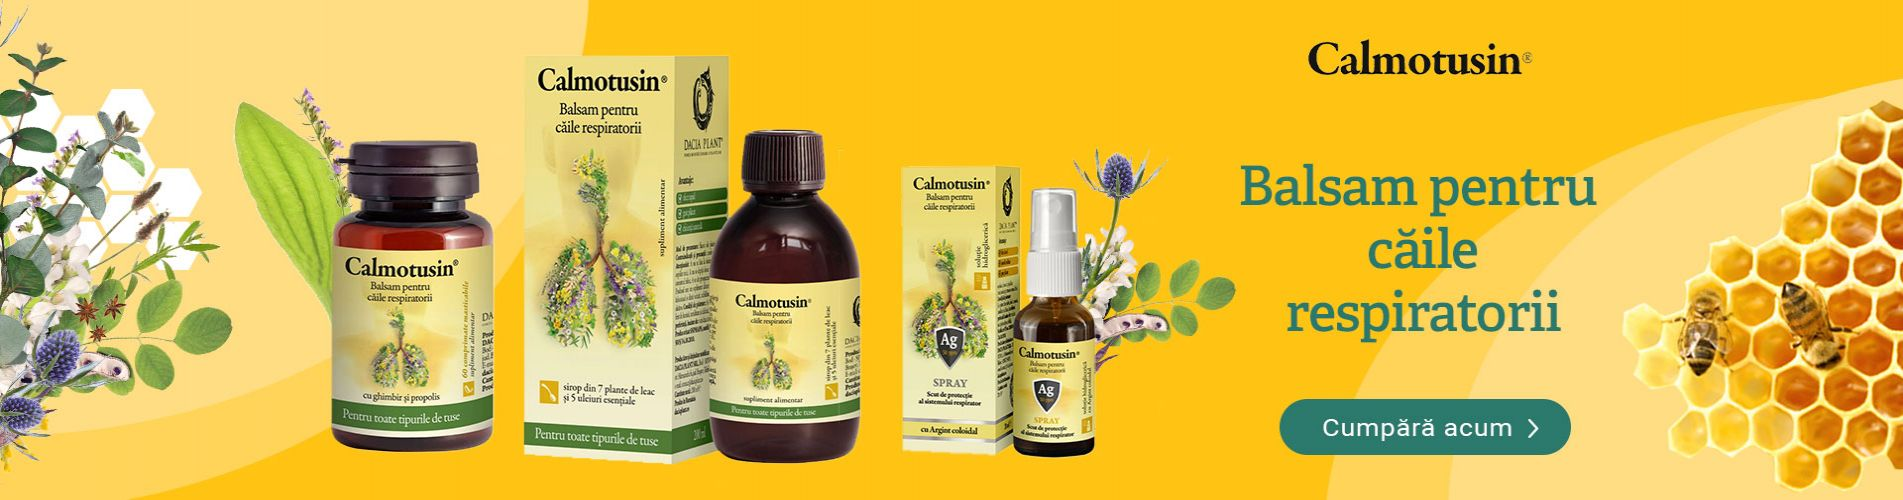 https://www.daciaplant.ro/categorii-produse/brand/calmotusin.html